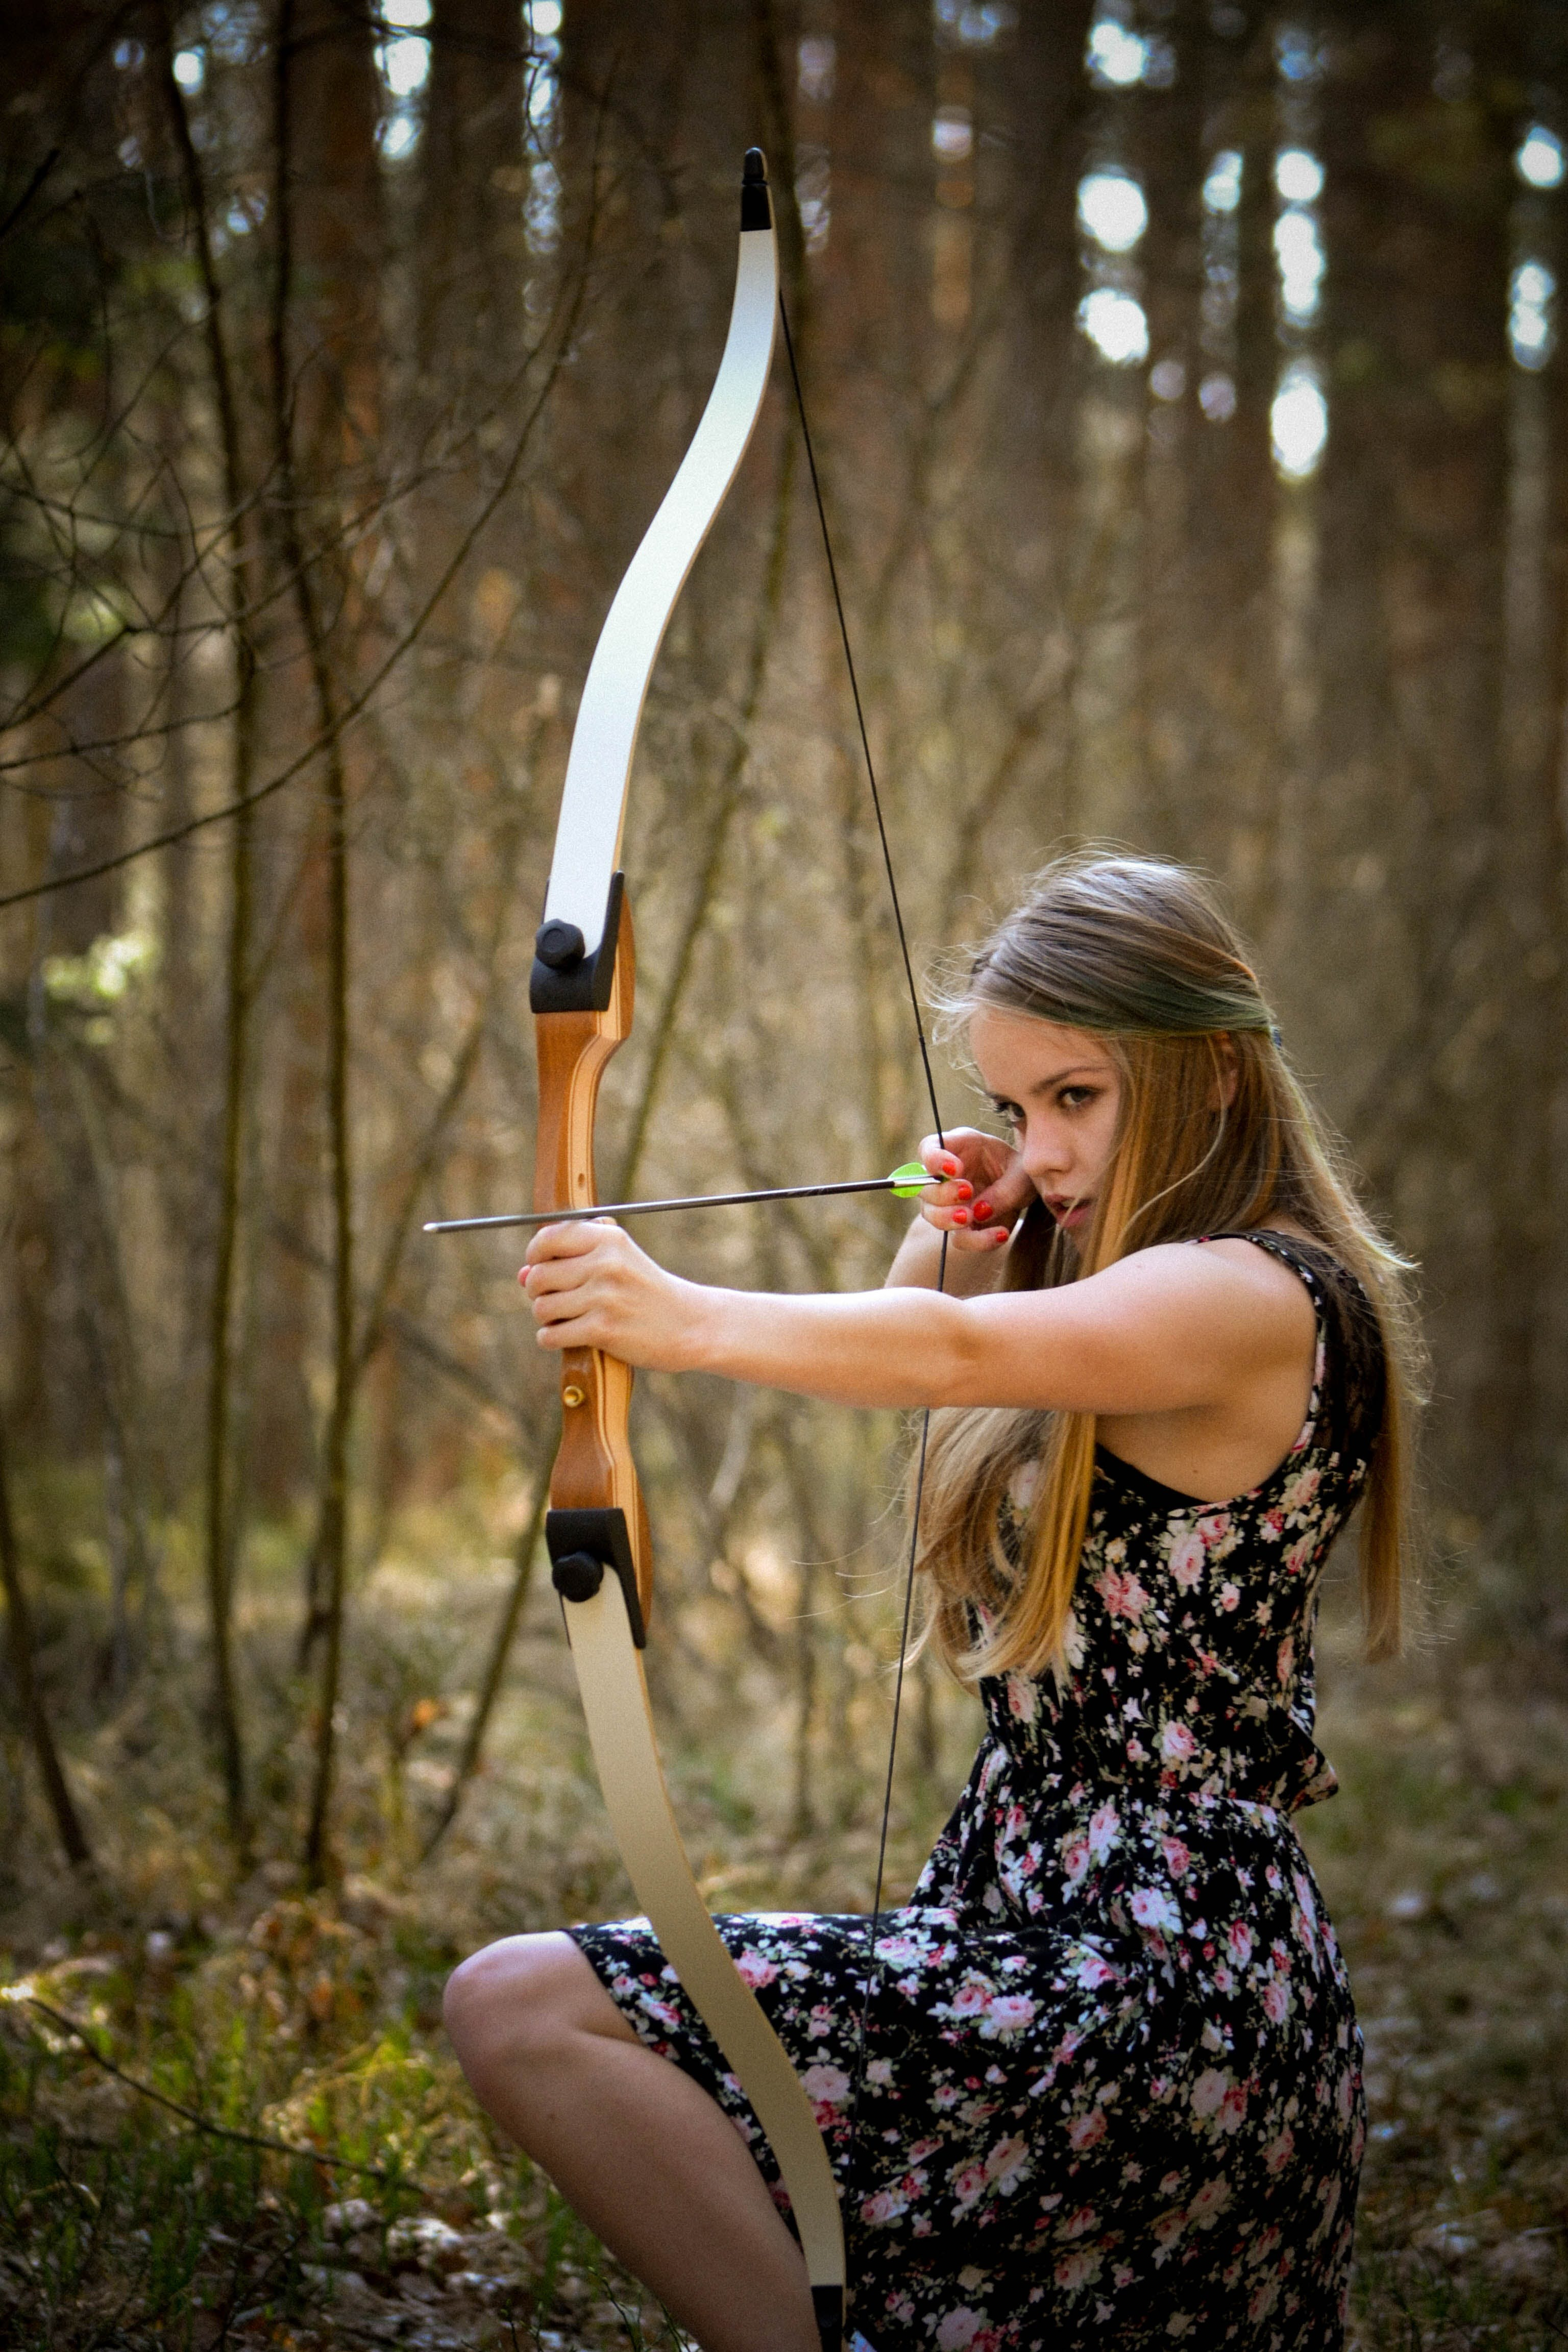 Woman Aiming Bow · Free Stock Photo